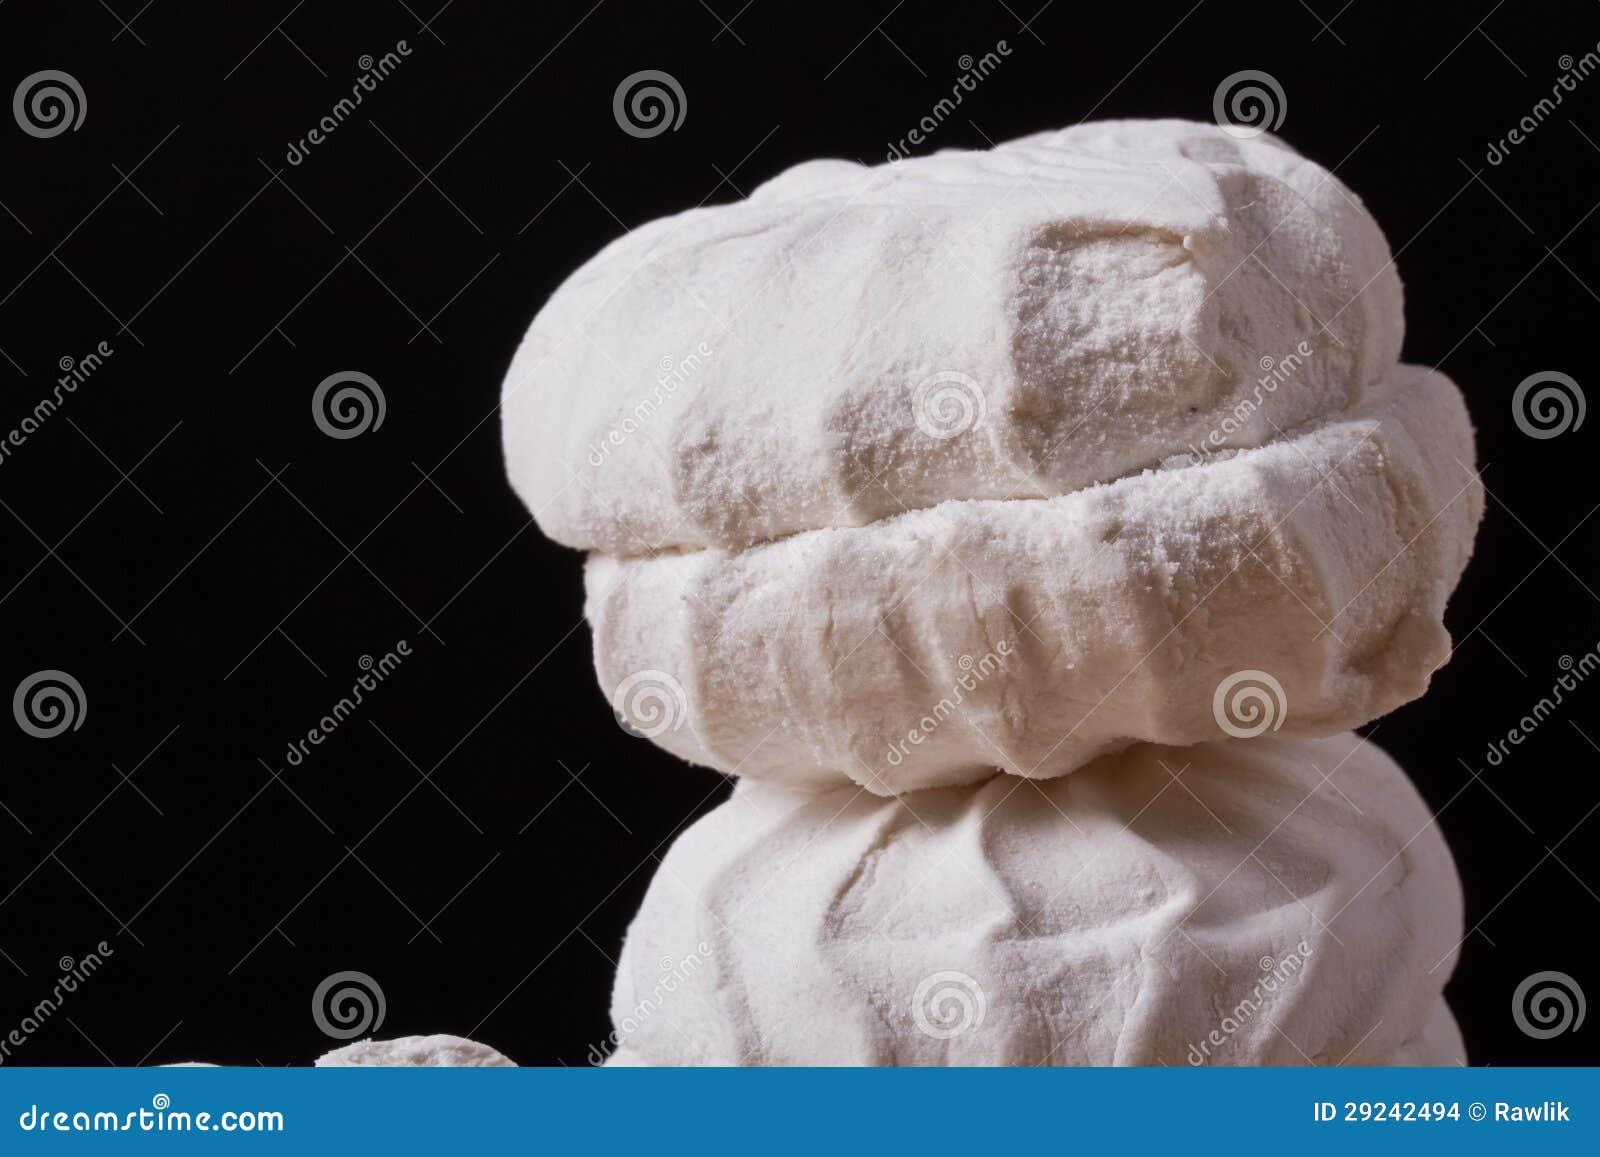 Download Doce do Marshmallow foto de stock. Imagem de açúcar, pegajoso - 29242494